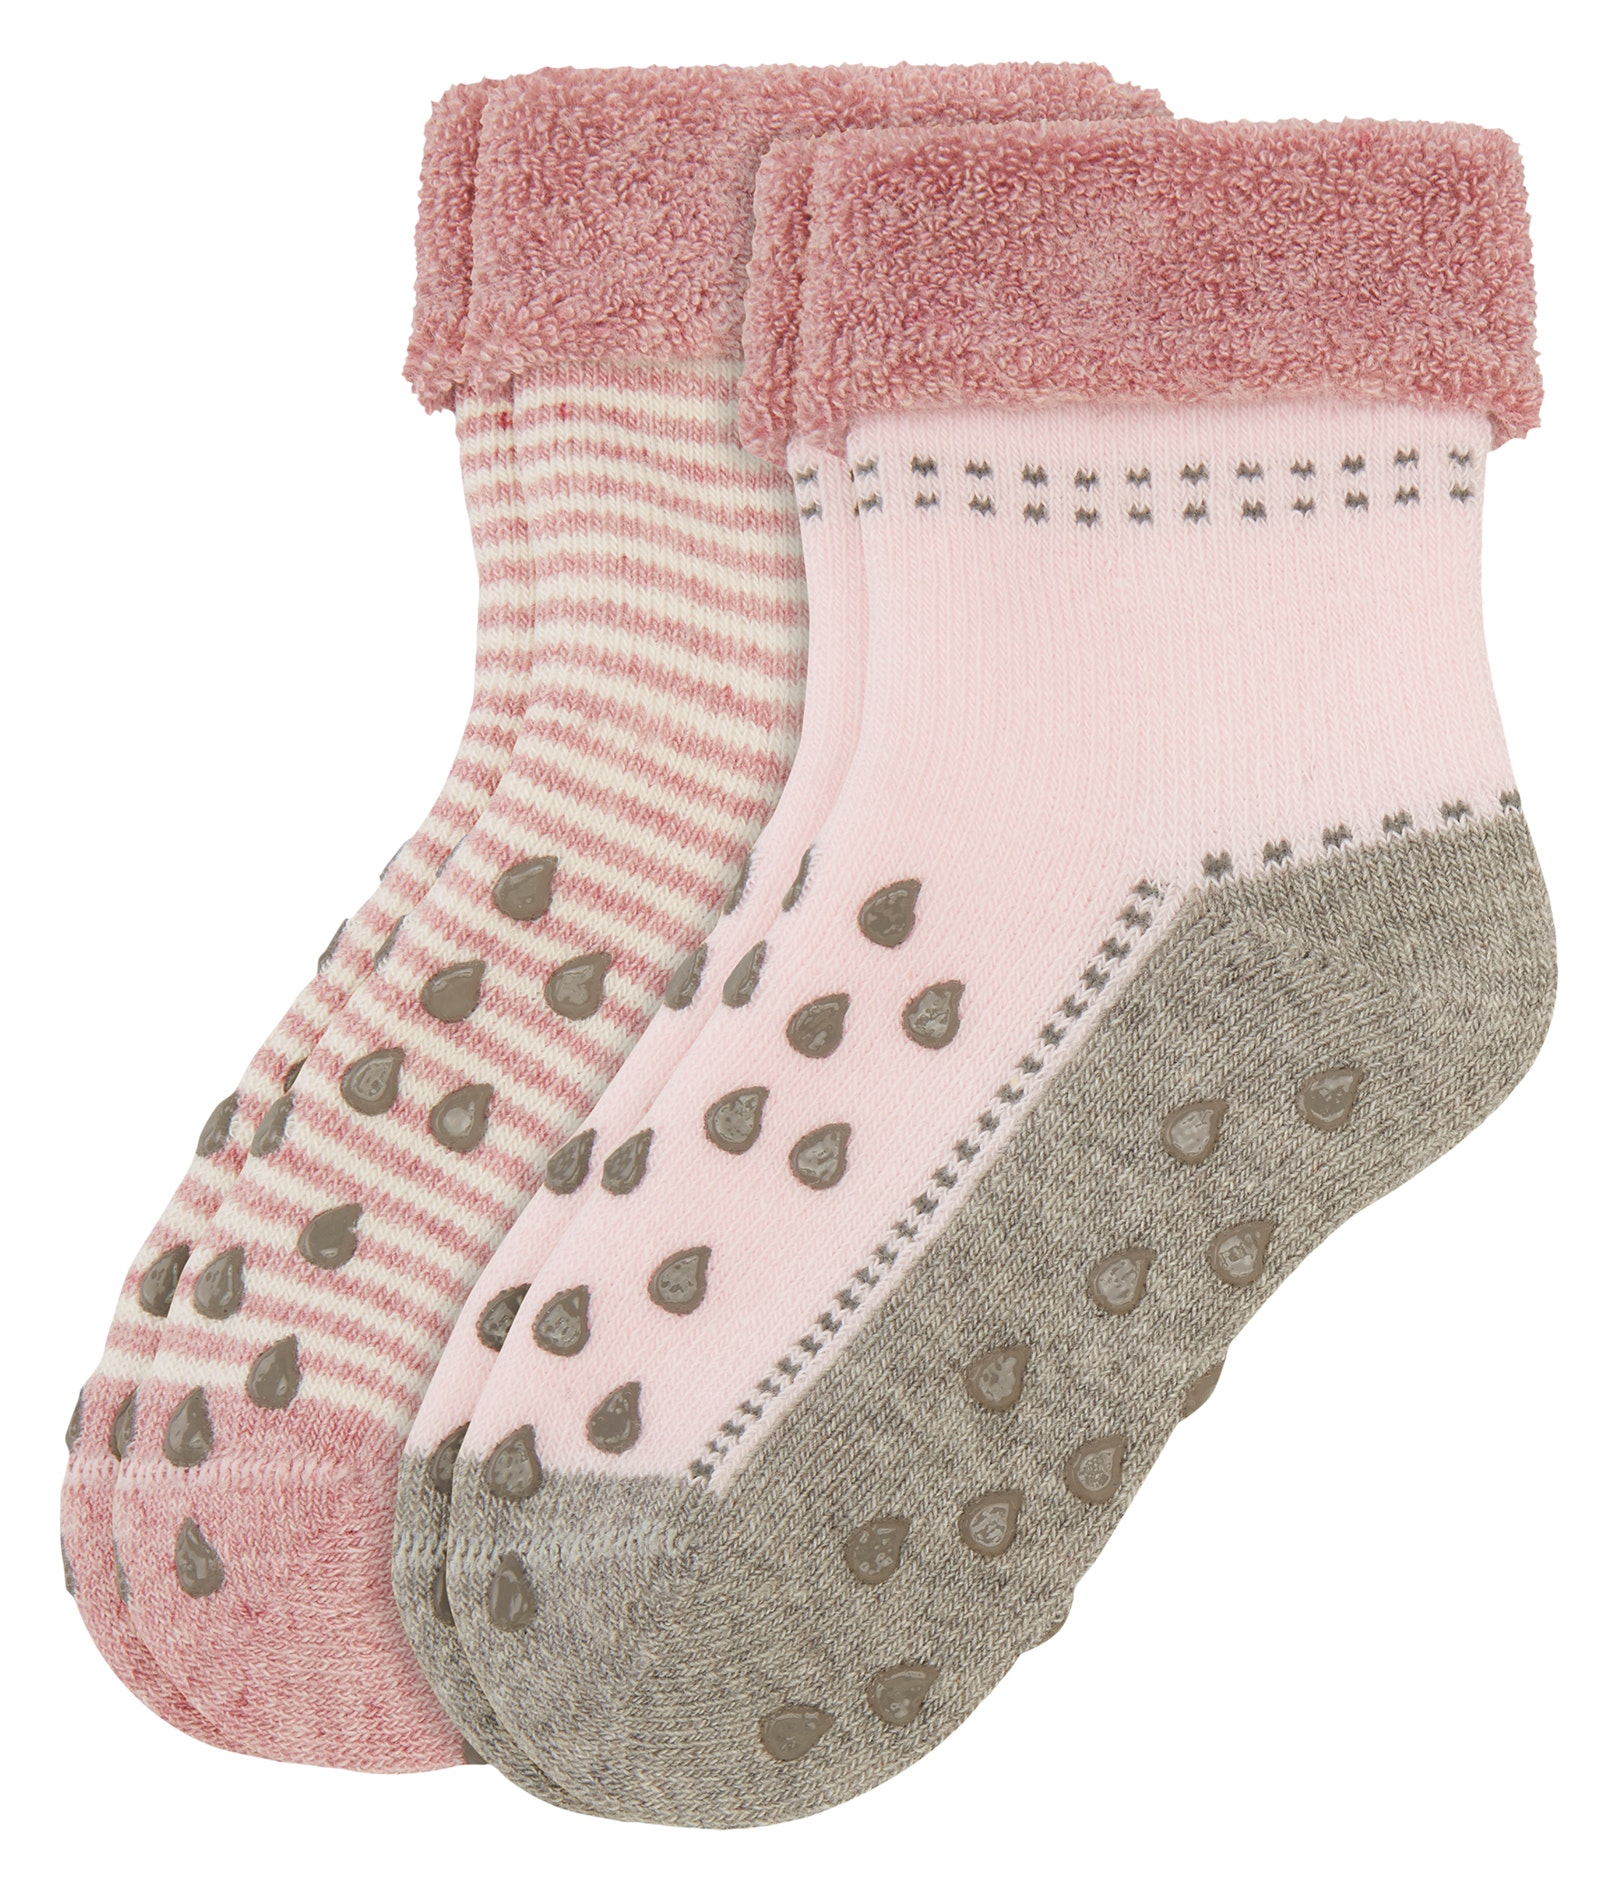 Baby Crawling ABS Socks 2p